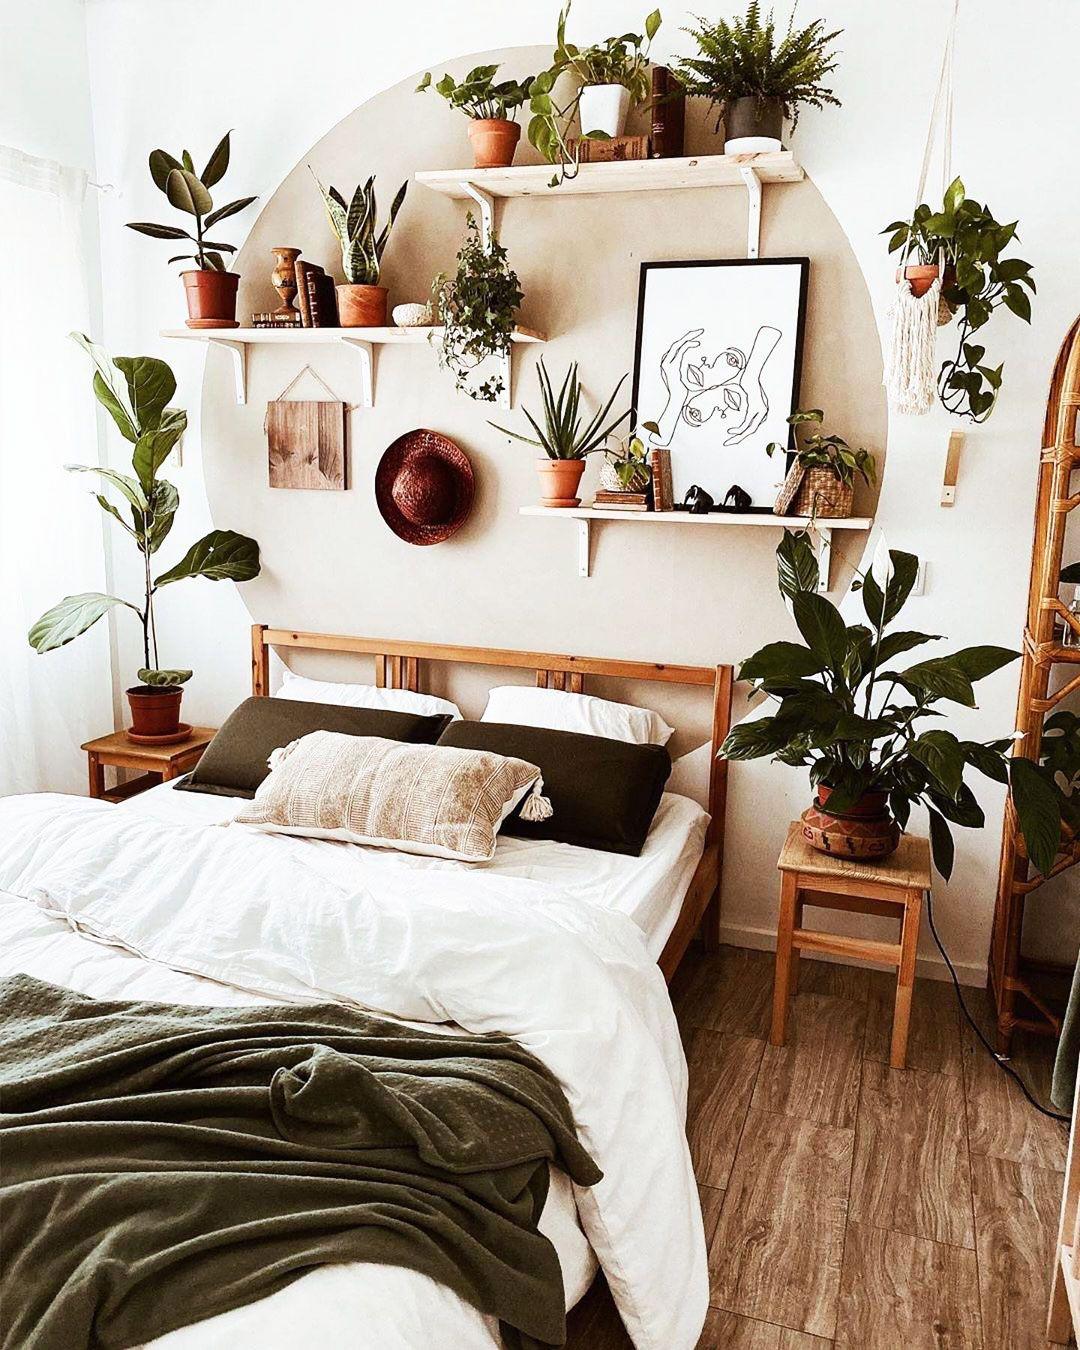 20 Amazing Small House Decorating Ideas